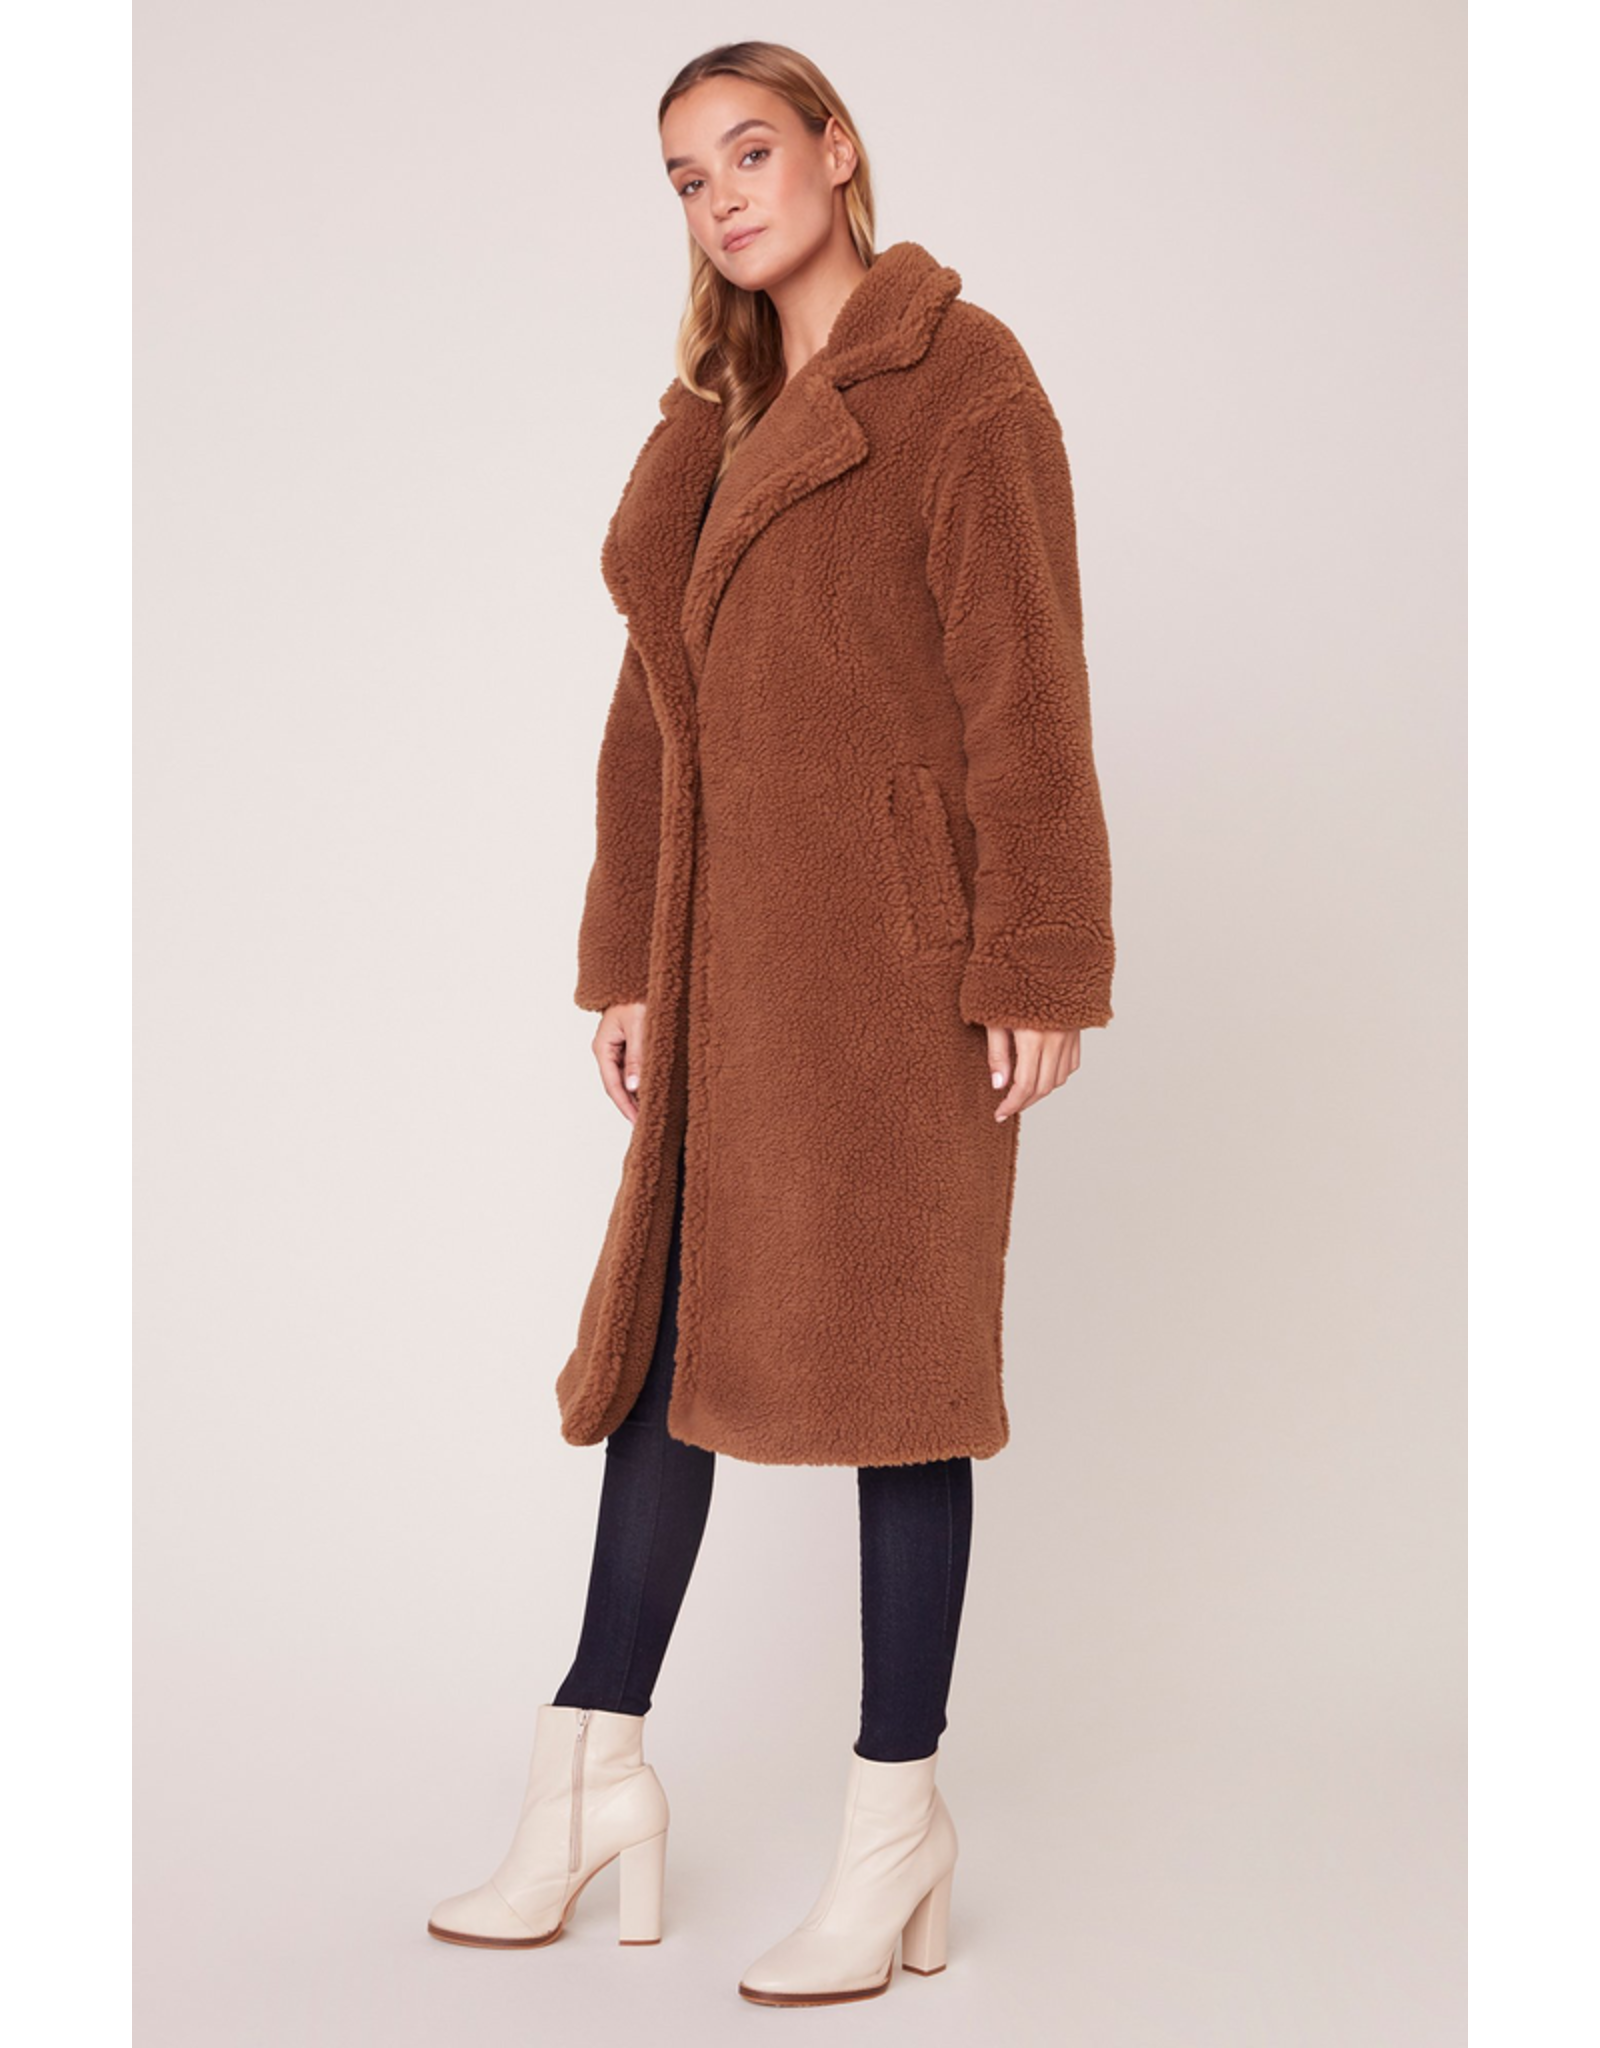 bb dakota bb dakota paddington coat